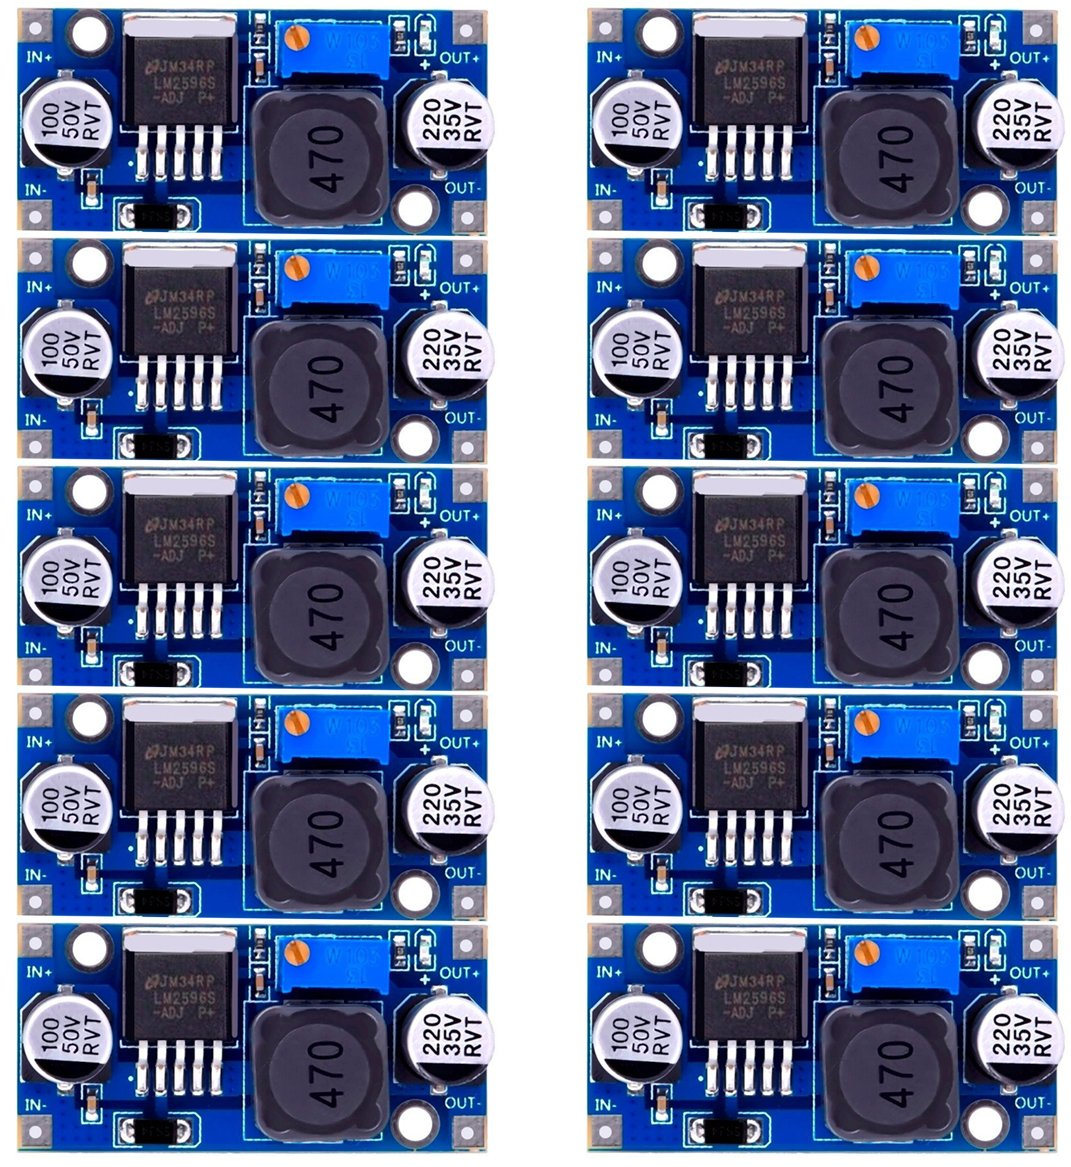 DaoRier LM2596 LM2596S De DC DC Converter 3,0 40 V hasta 1,5 1 pieza 35 V ajustable Fuente de alimentaci/ón Step Down M/ódulo para Arduino